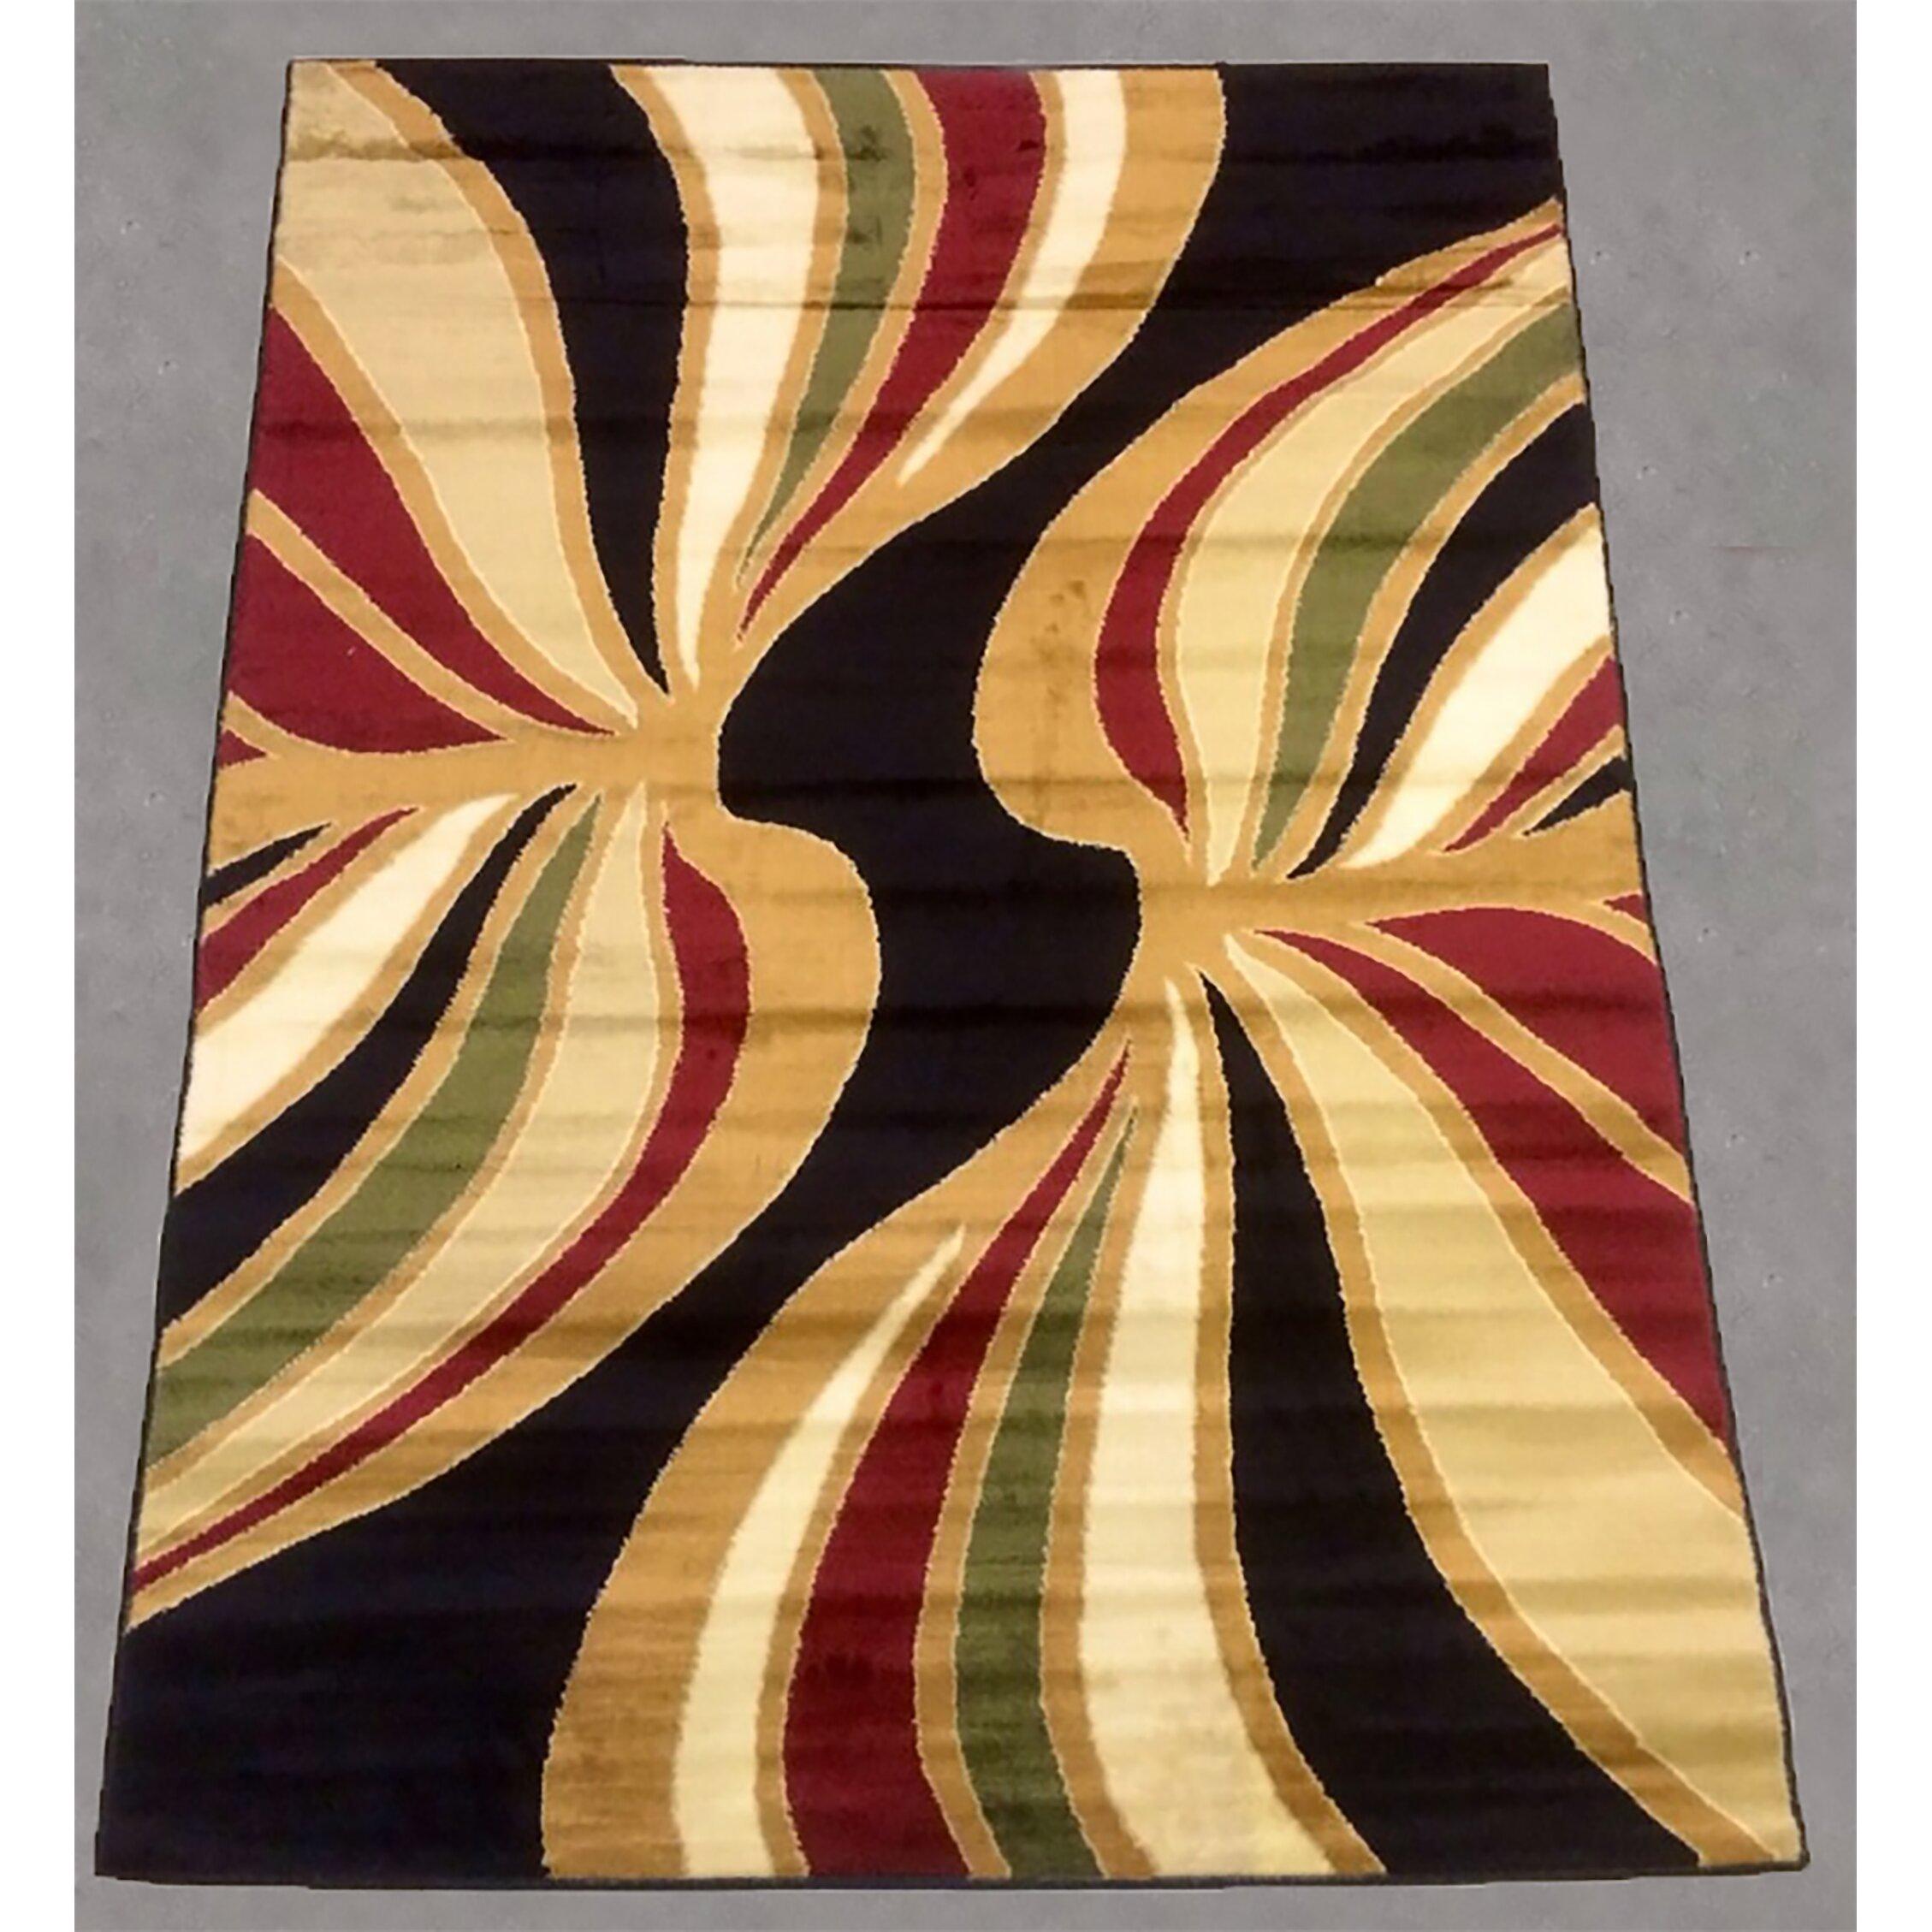 d cor rugs 5 39 x 8 39 area rugs brady home sku brdh1017